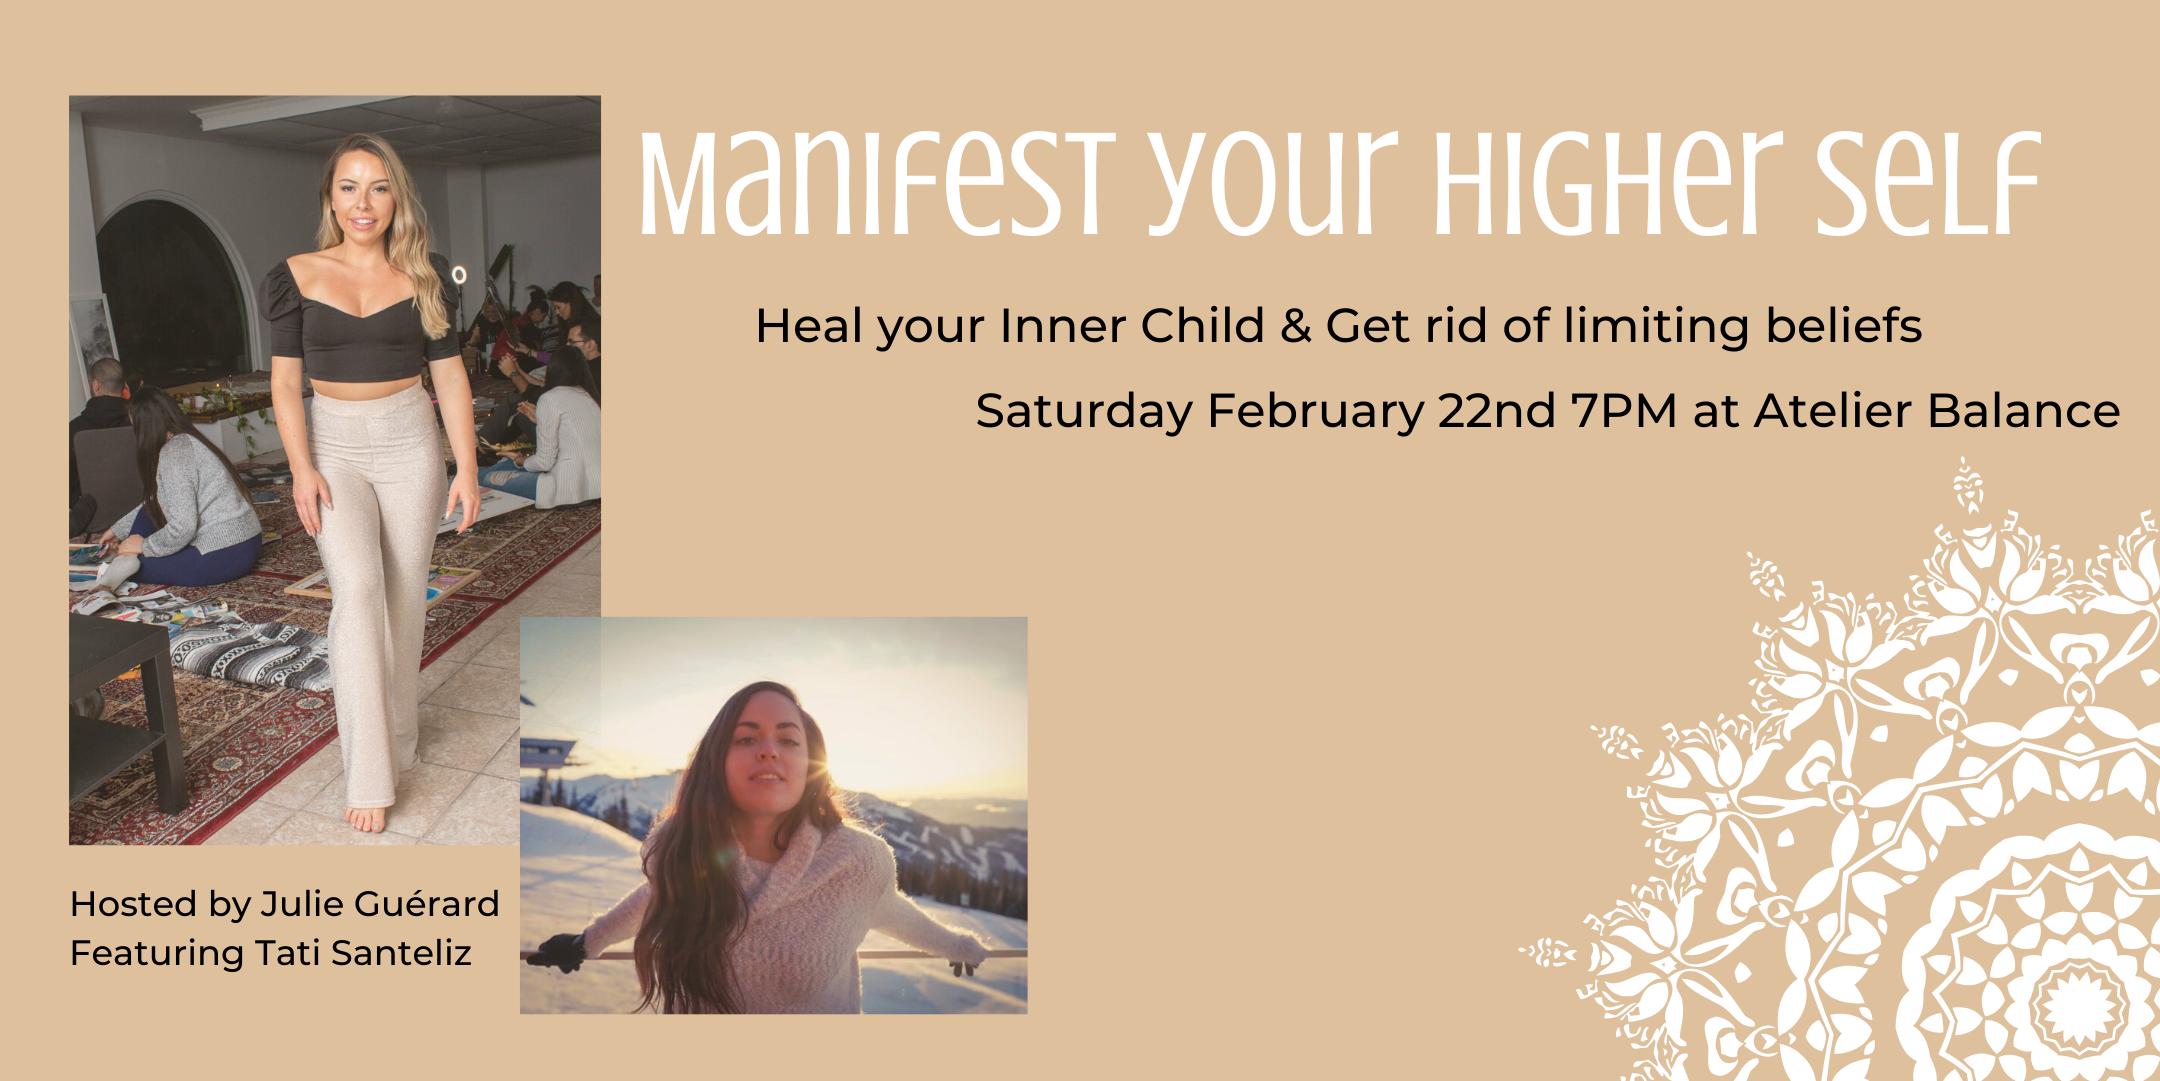 Manifest your Higher Self